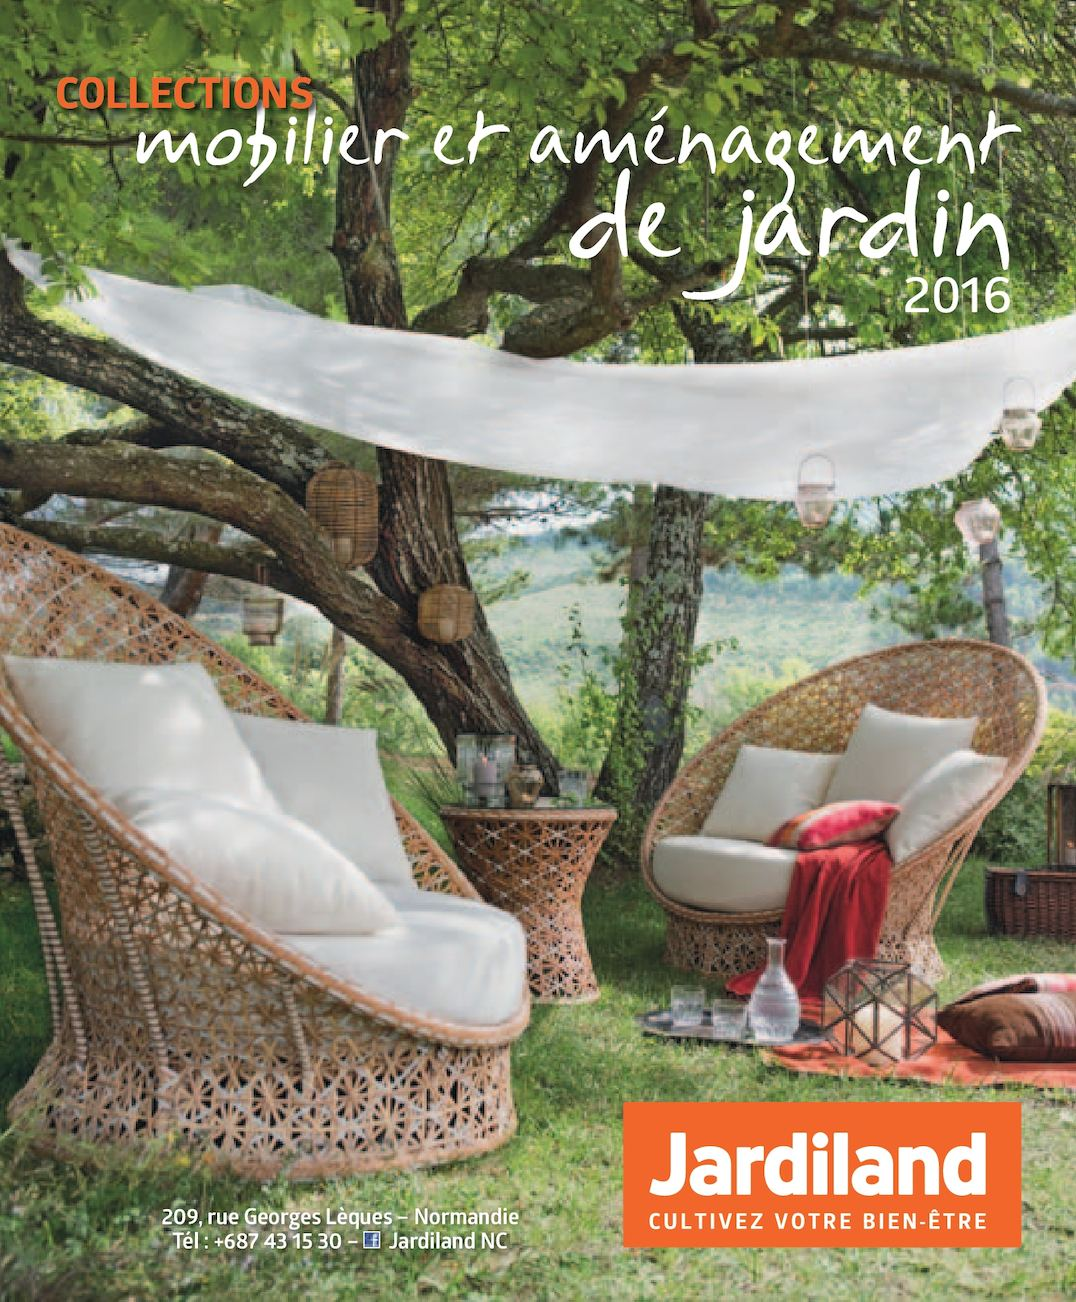 Calaméo - 2016 Jardiland